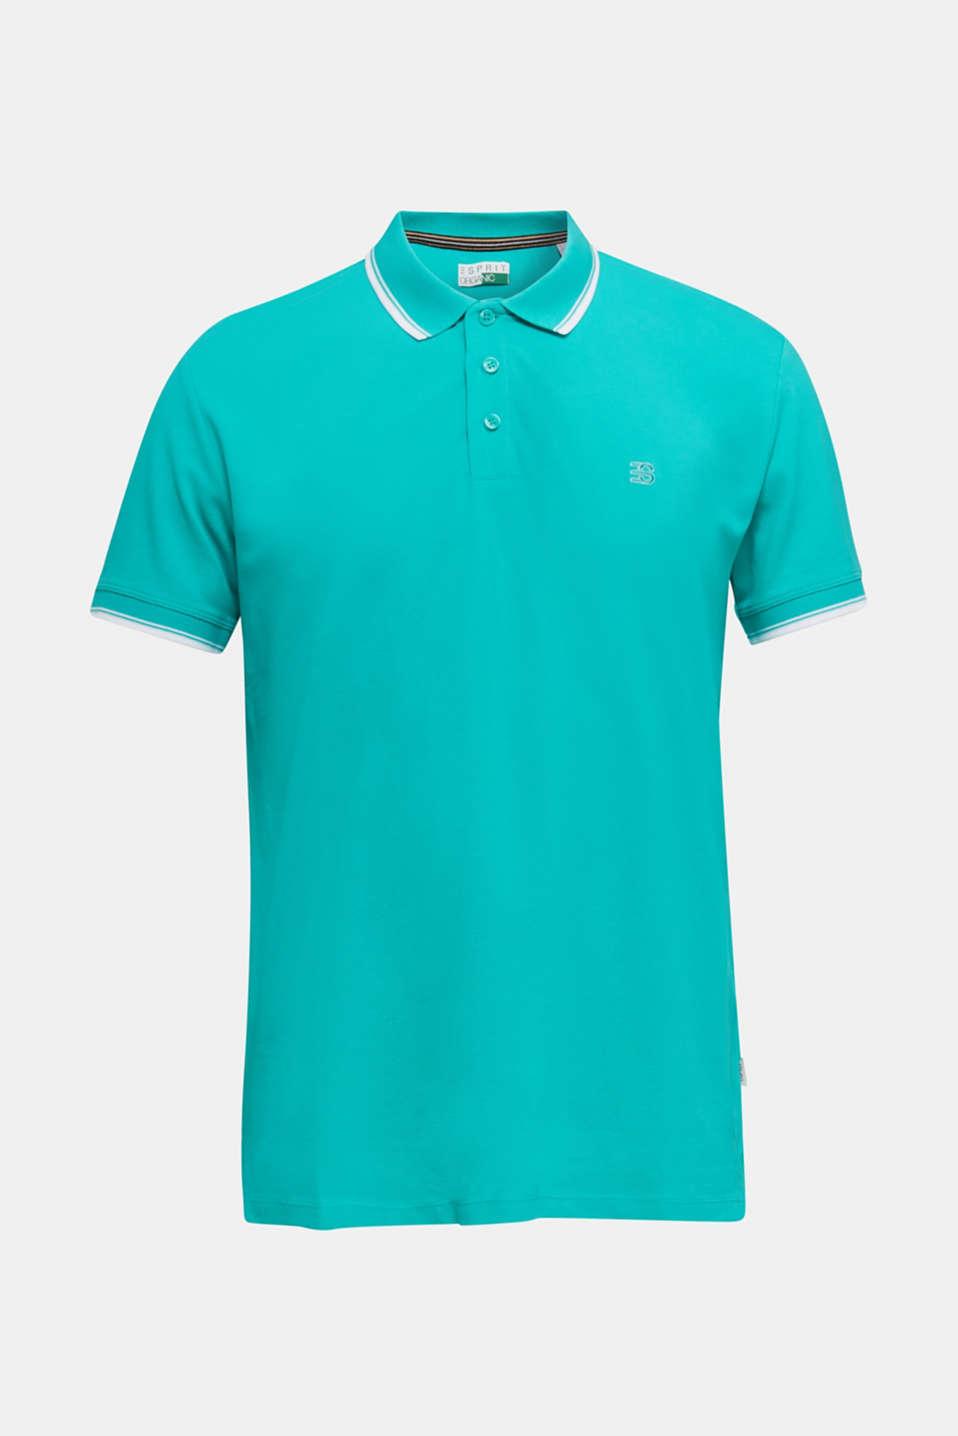 Piqué polo shirt in 100% cotton, AQUA GREEN, detail image number 6